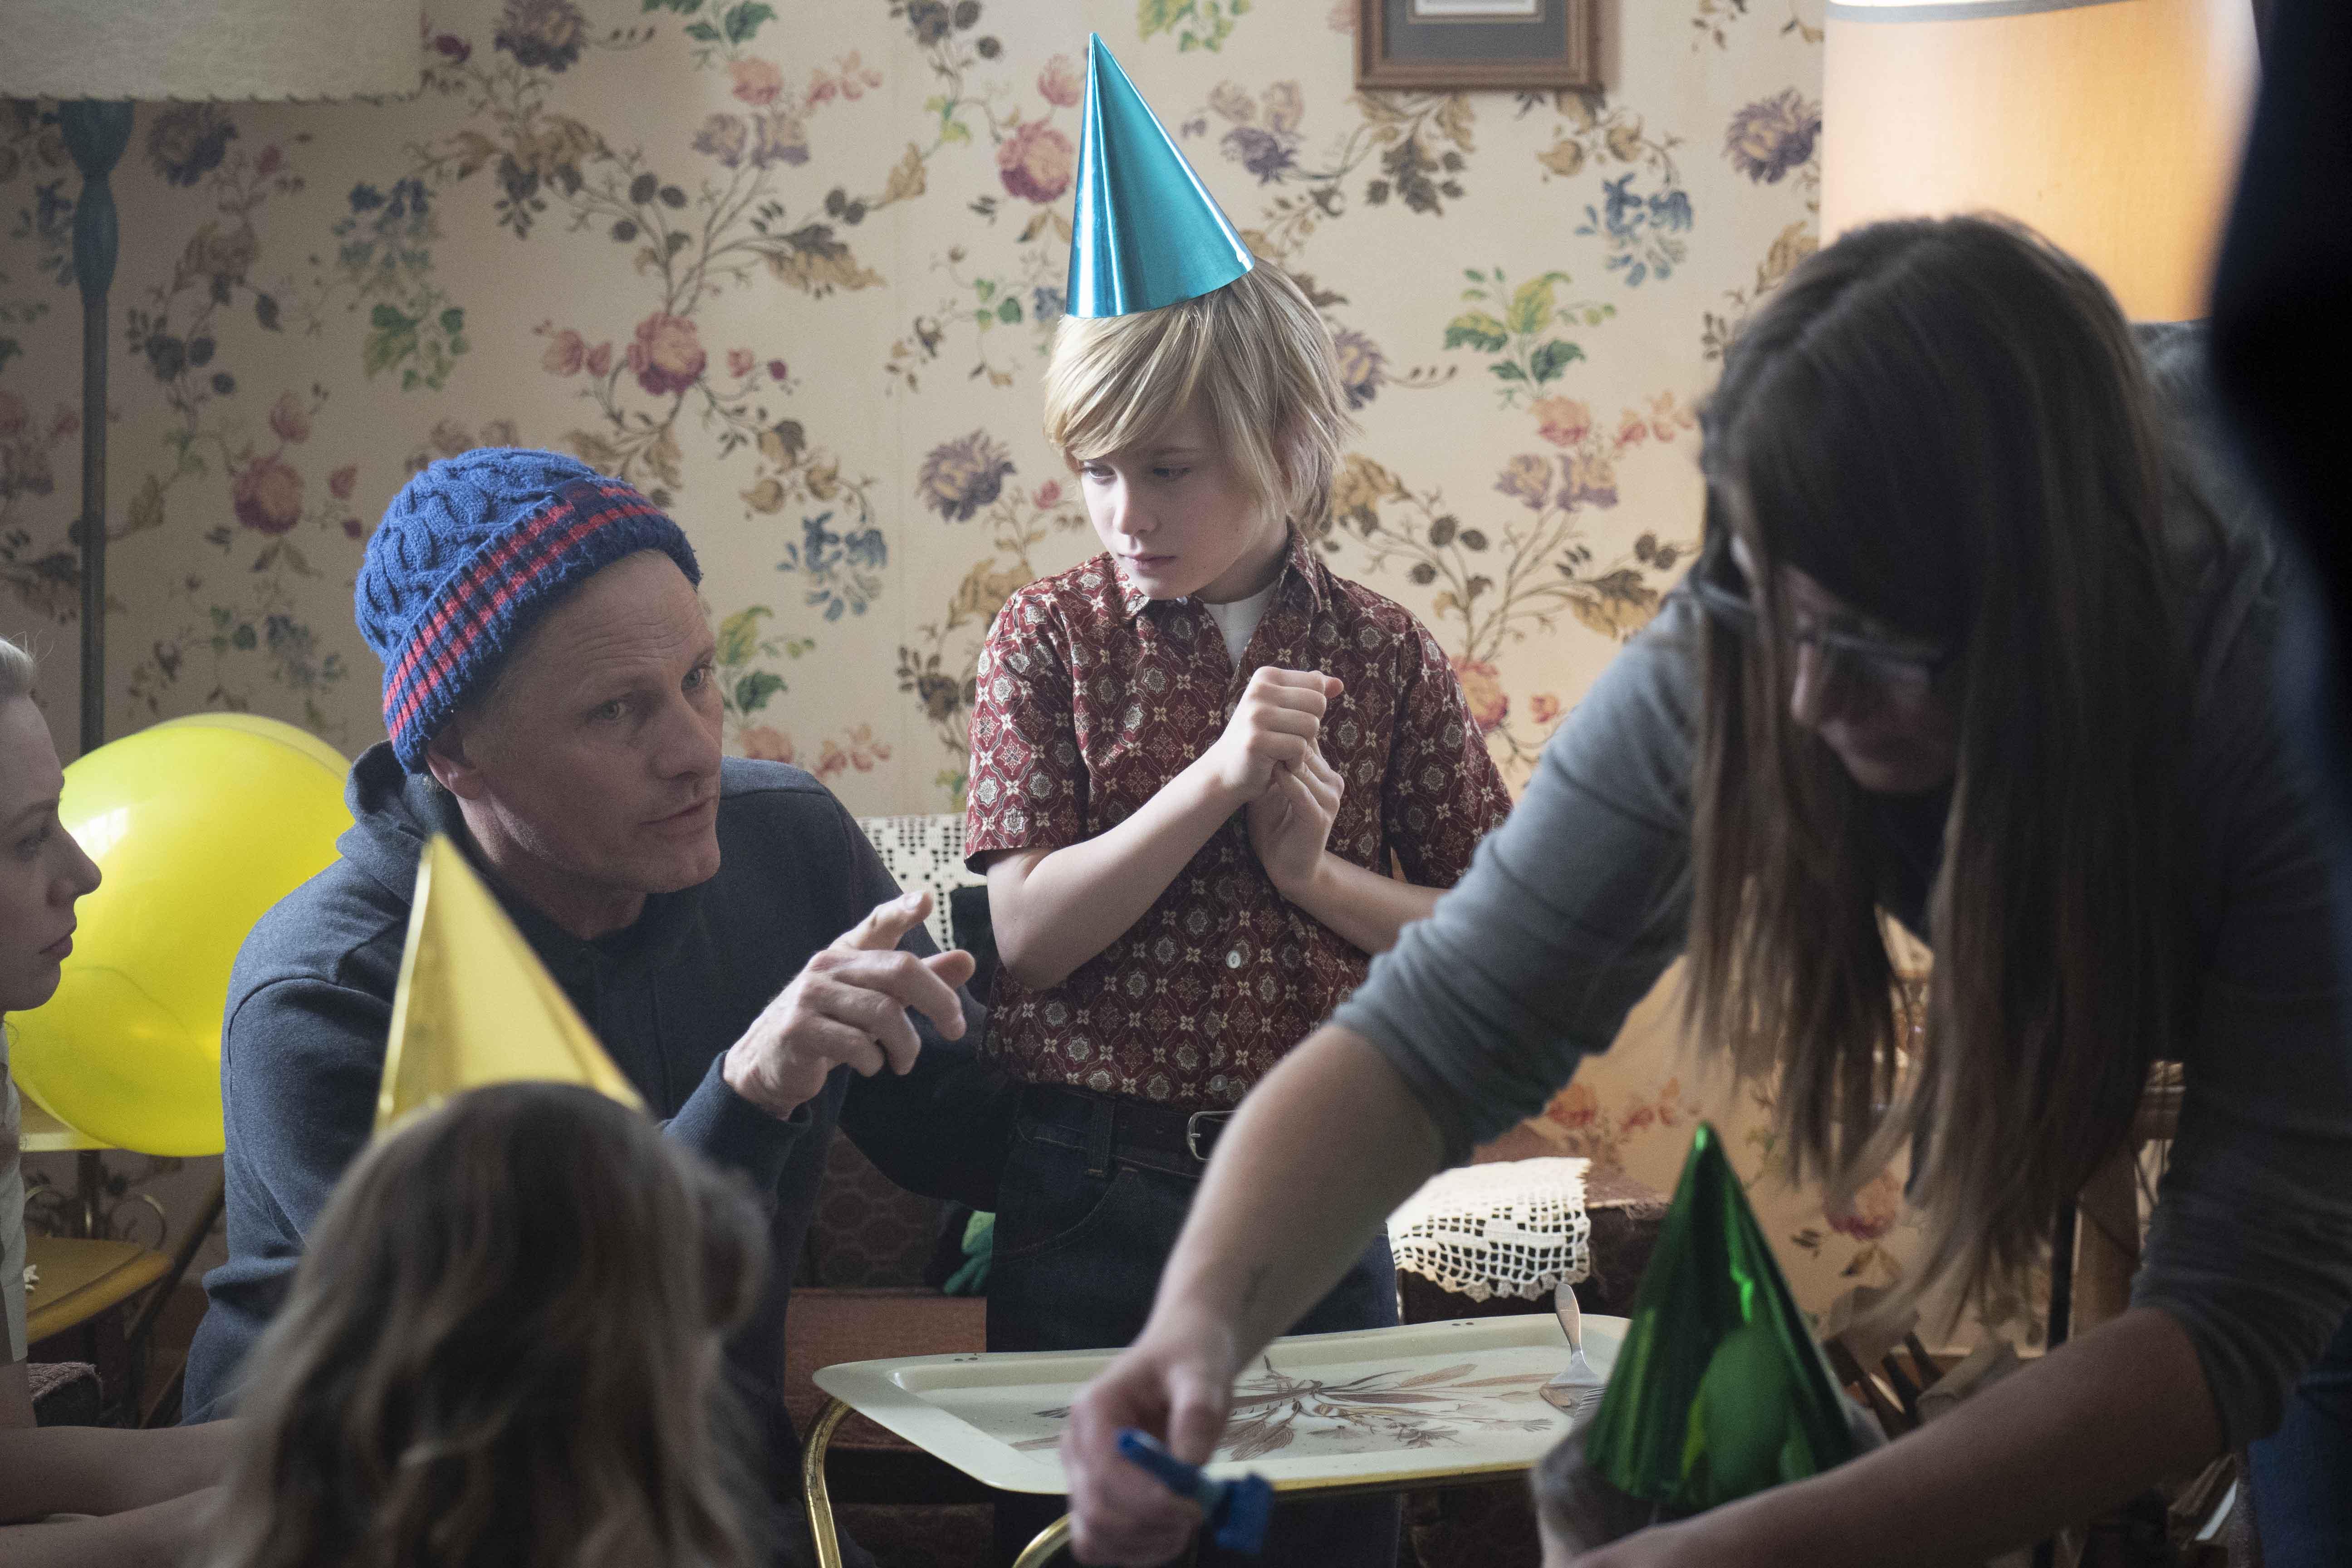 Falling - Storia di un padre recensione film Viggo Mortensen Lance Henriksen